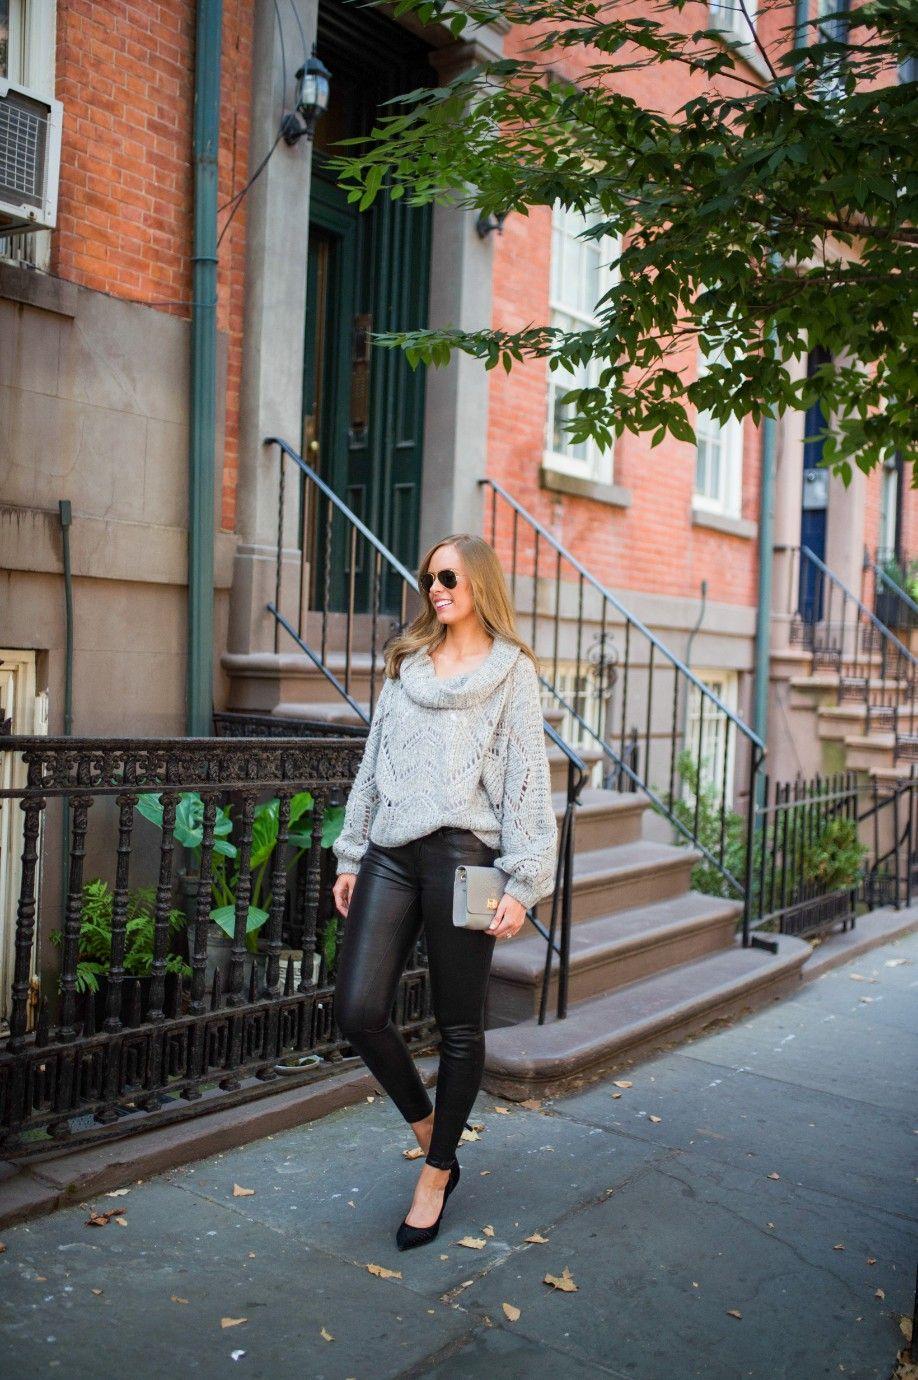 4befb77c435 Sweater Weather Look! #cozy #chunkysweater #leatherpants #blackandgrey  #fashionblogger